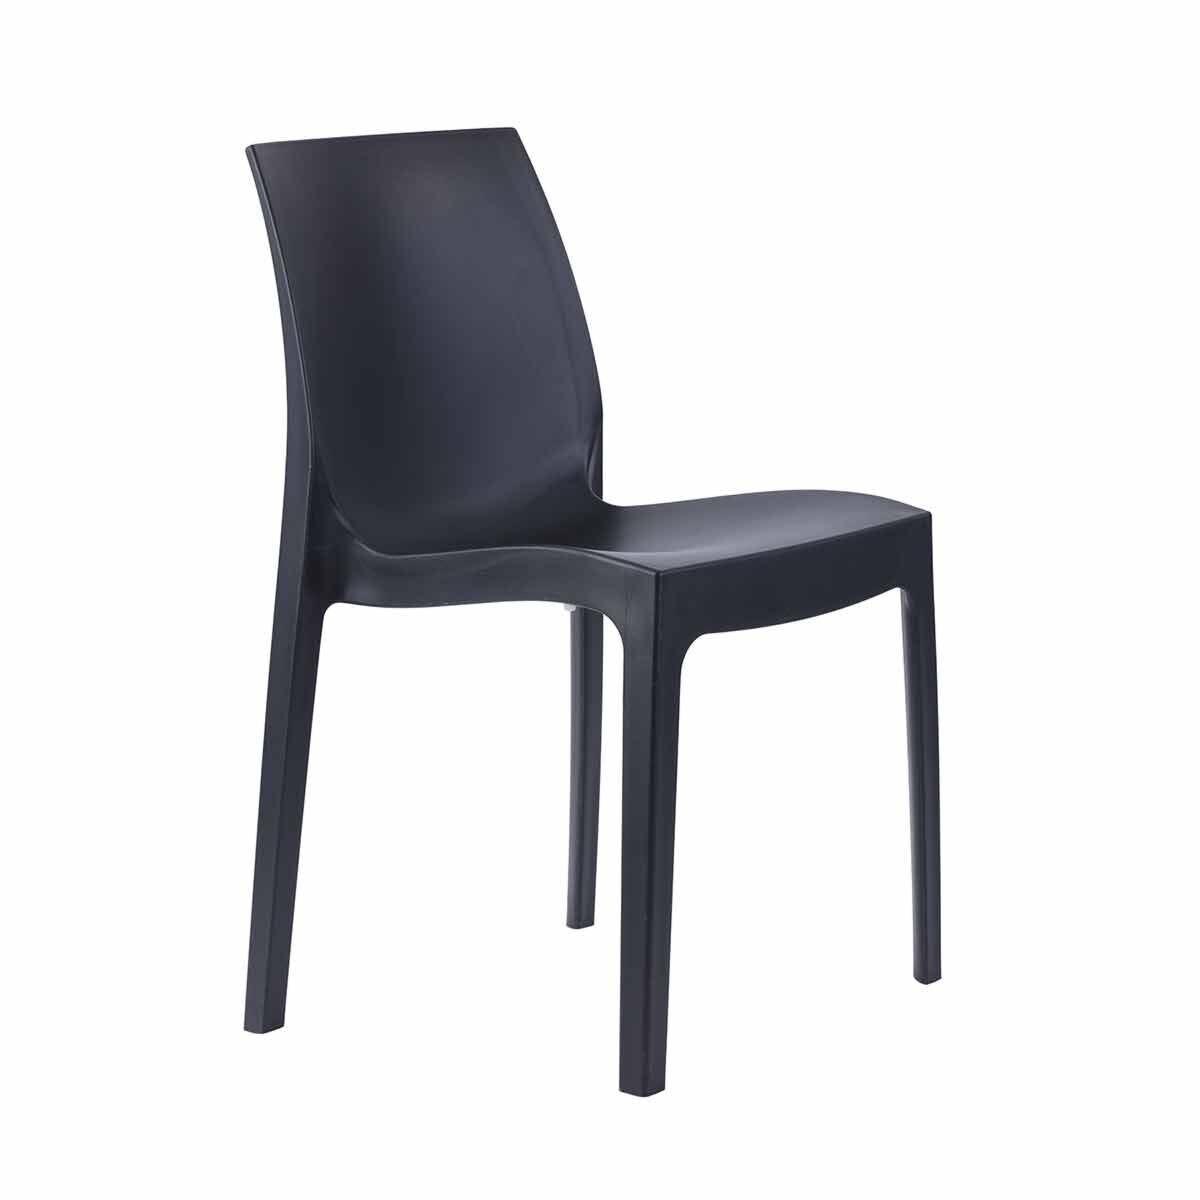 Tabilo Strata Polypropylene Stacking Chair Anthracite